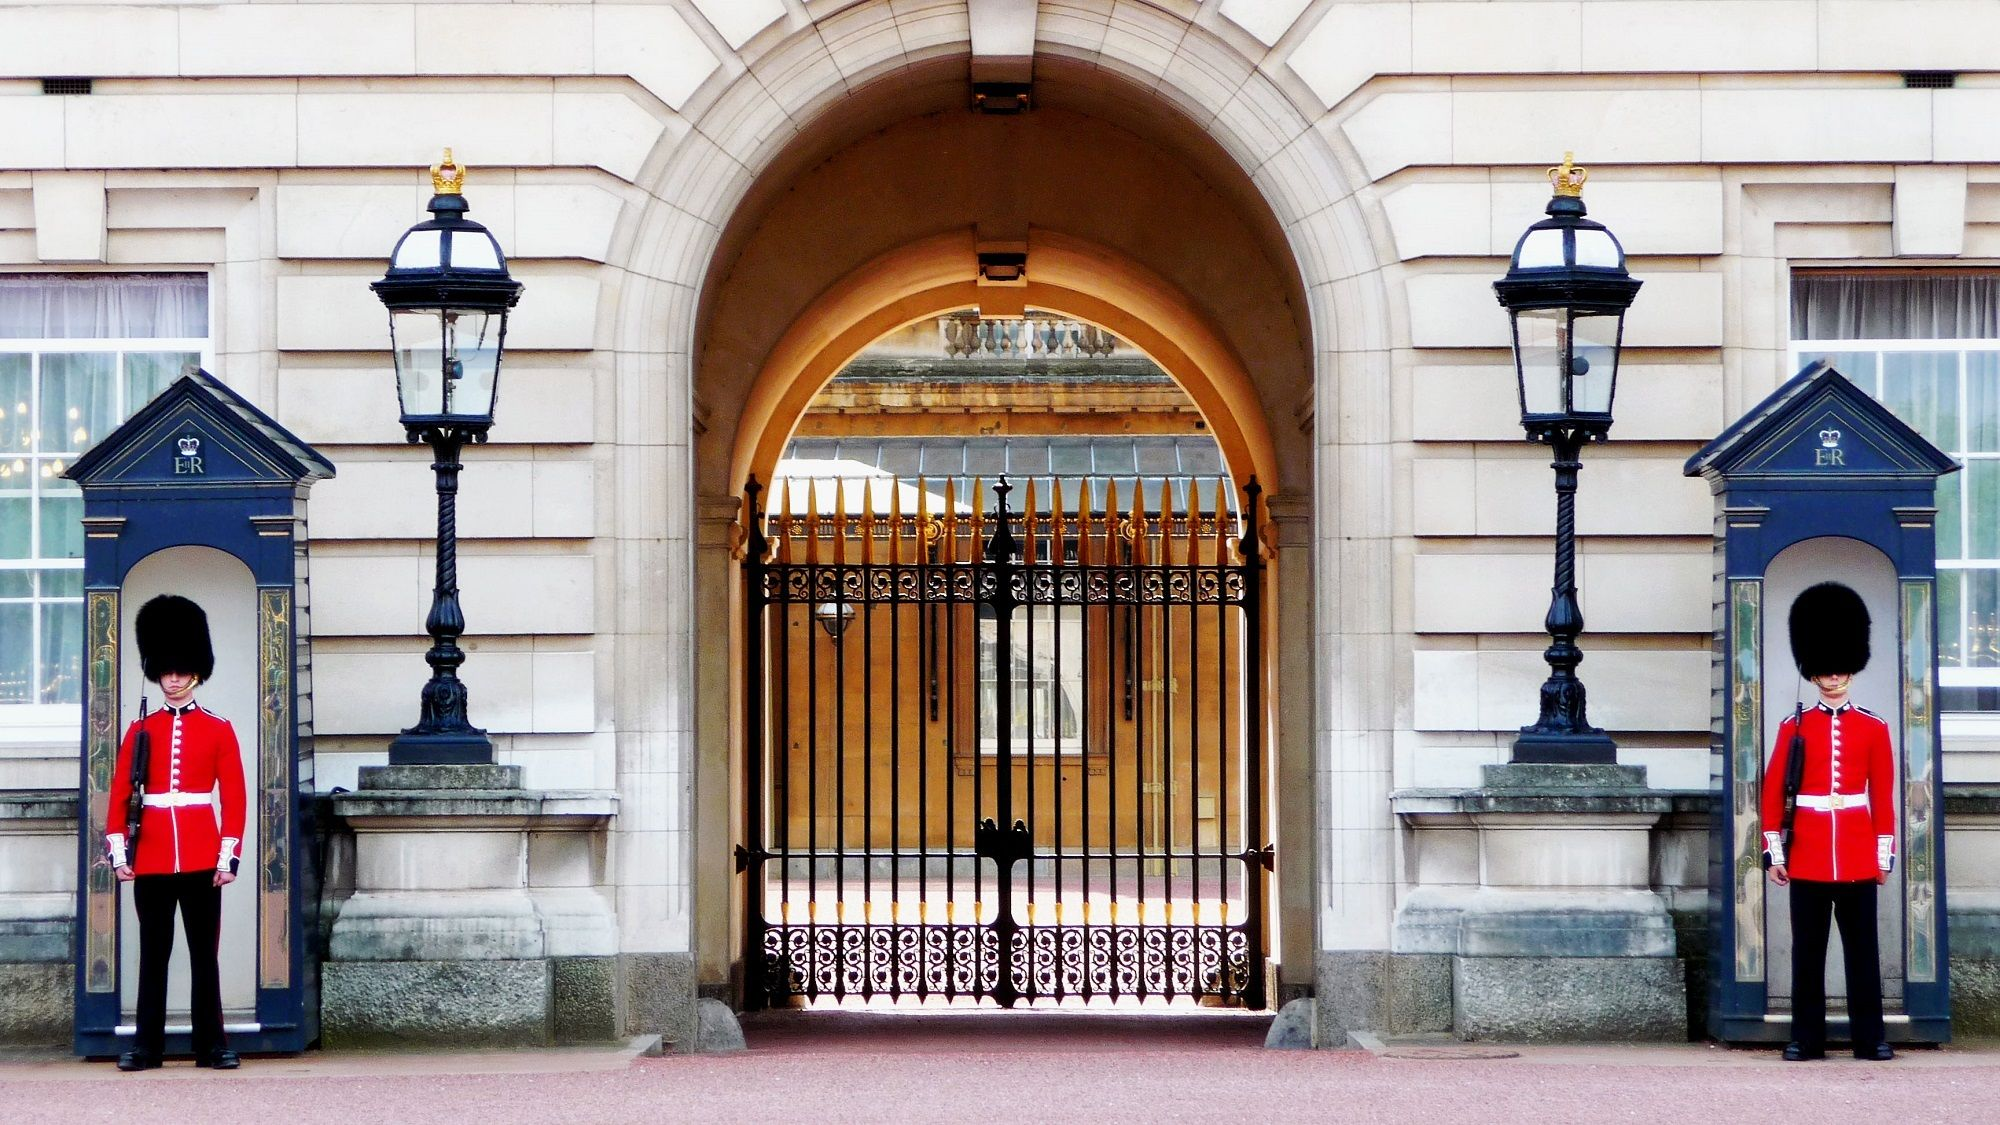 Buckingham Palace Will Be Undergoing A 10-Year Renovation